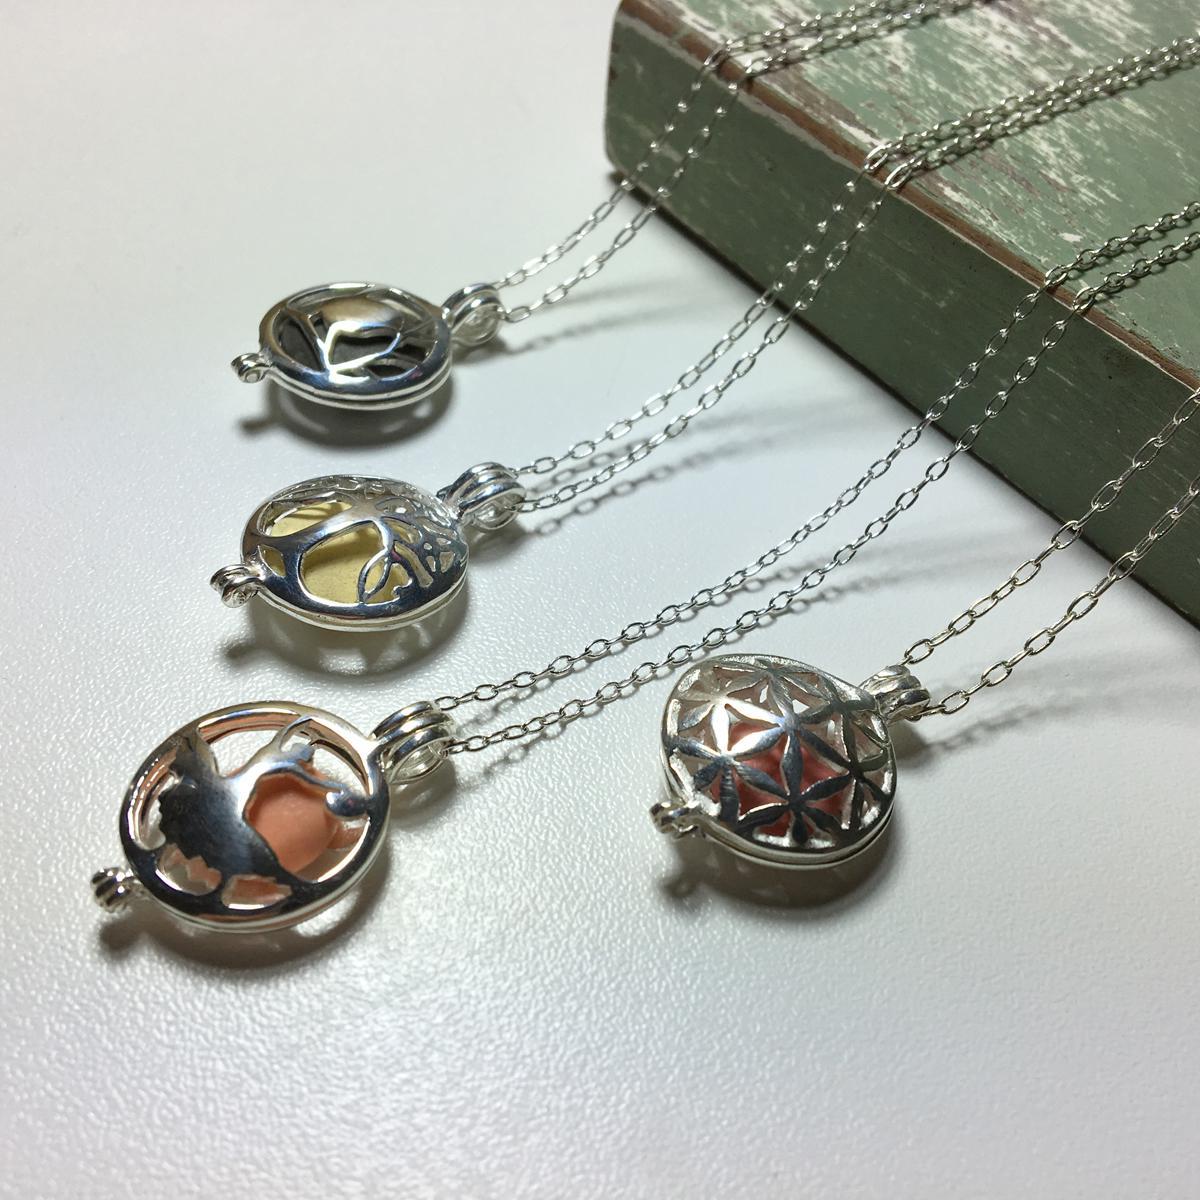 scent pendants